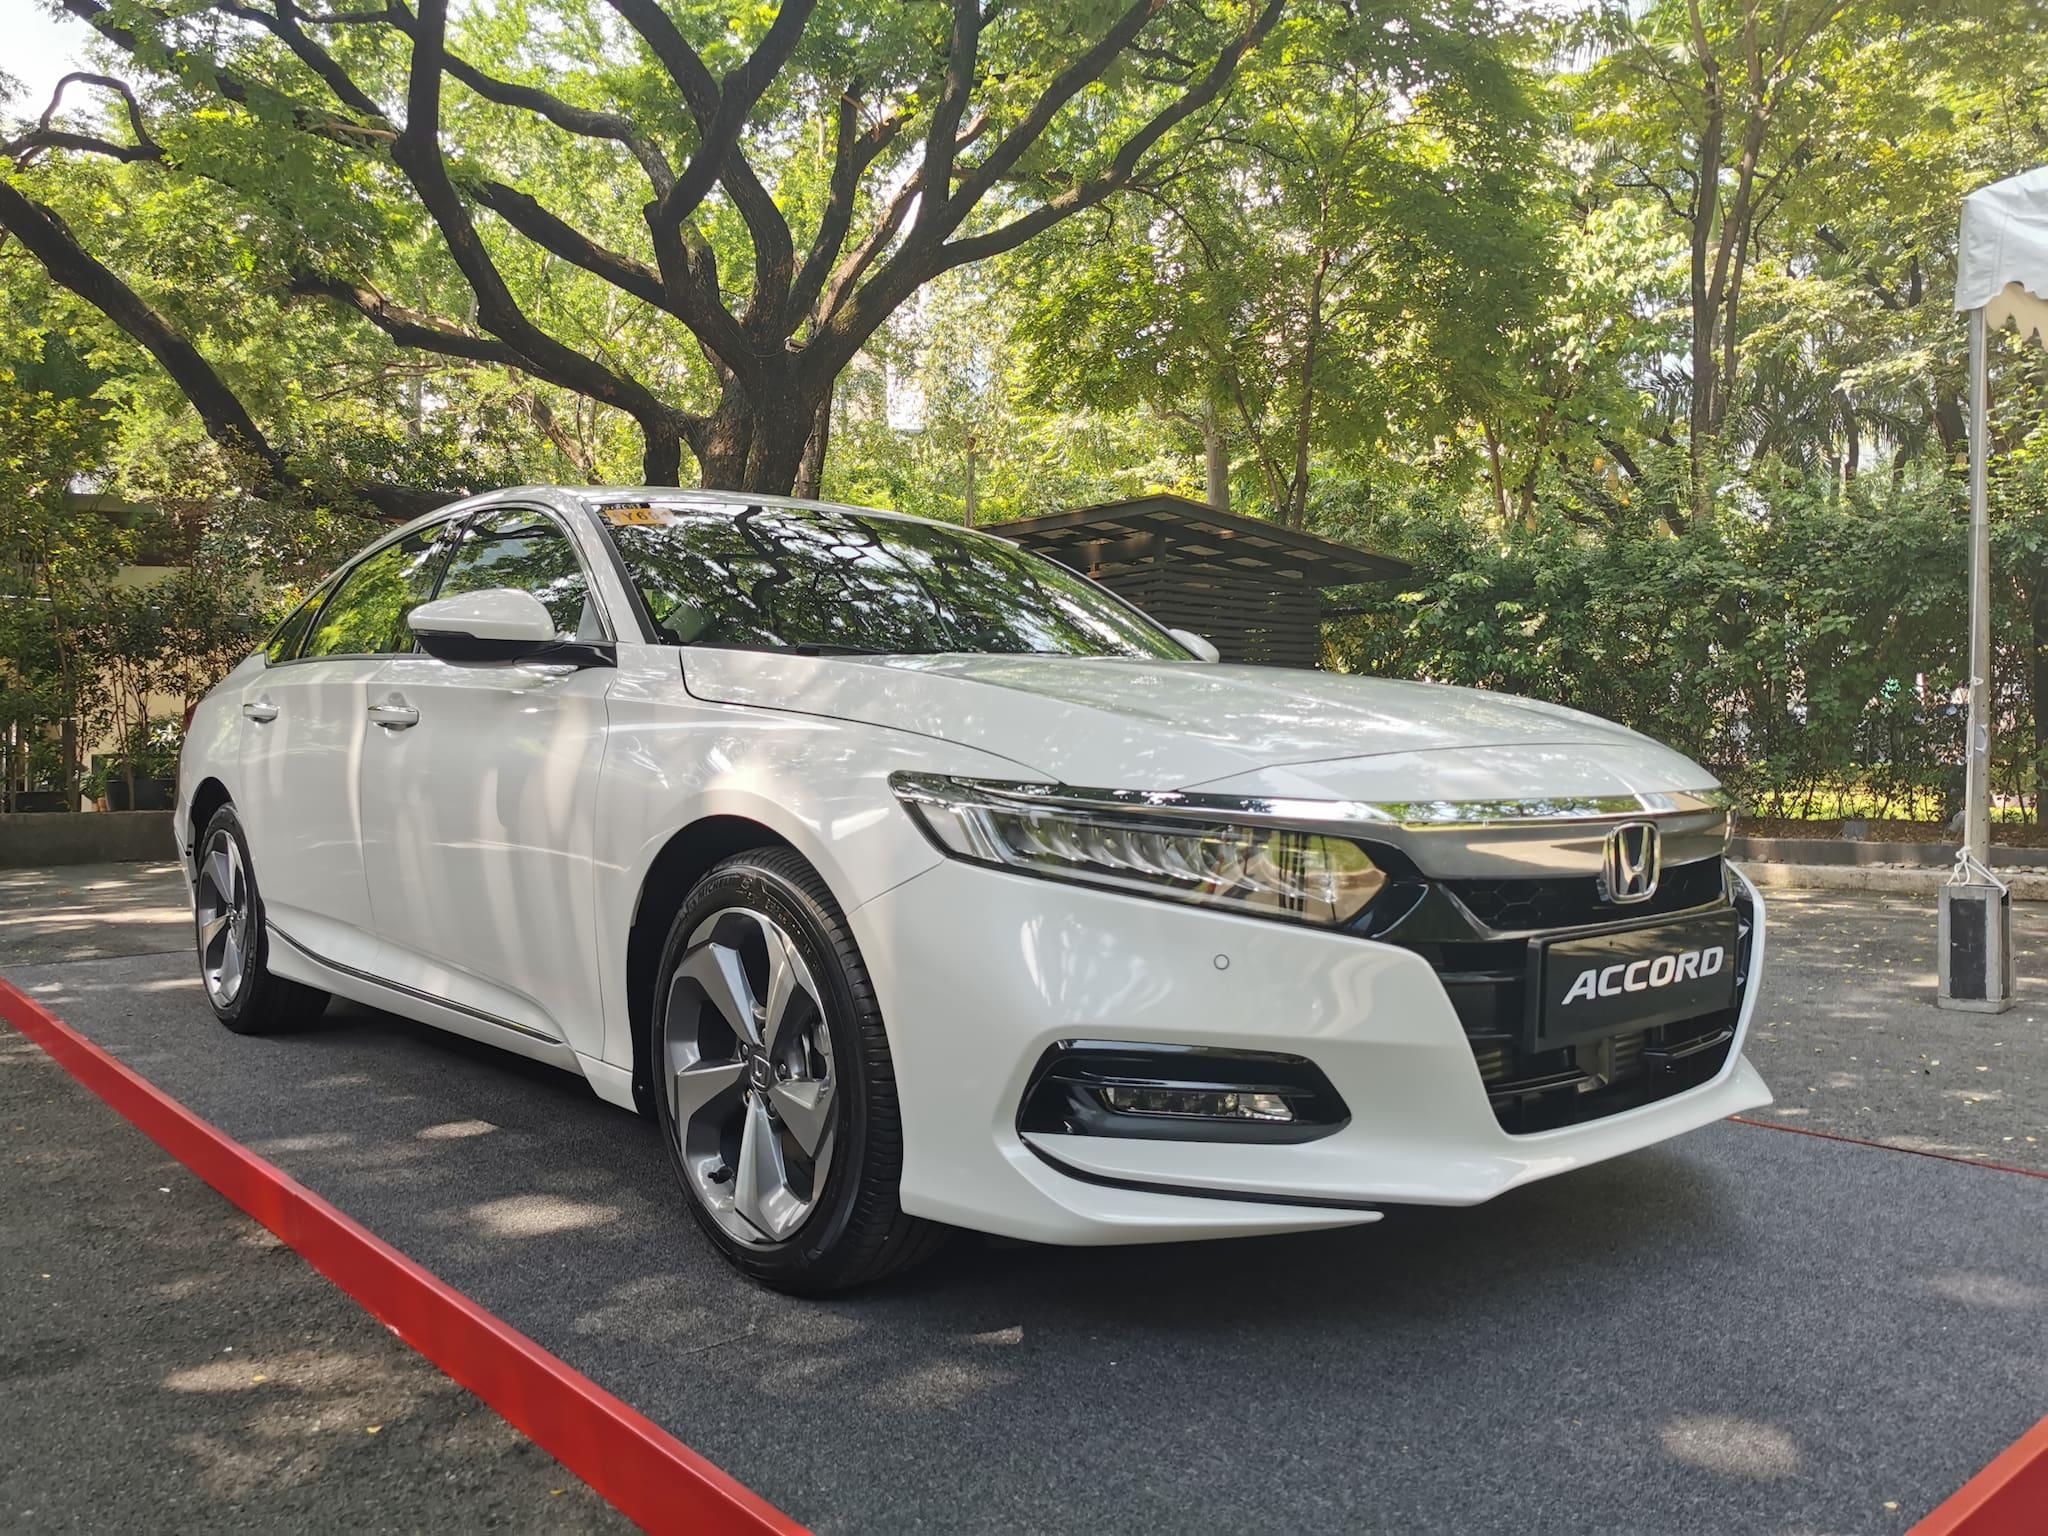 Honda Cars PH Unveils All-New, 10th-Generation Honda Accord